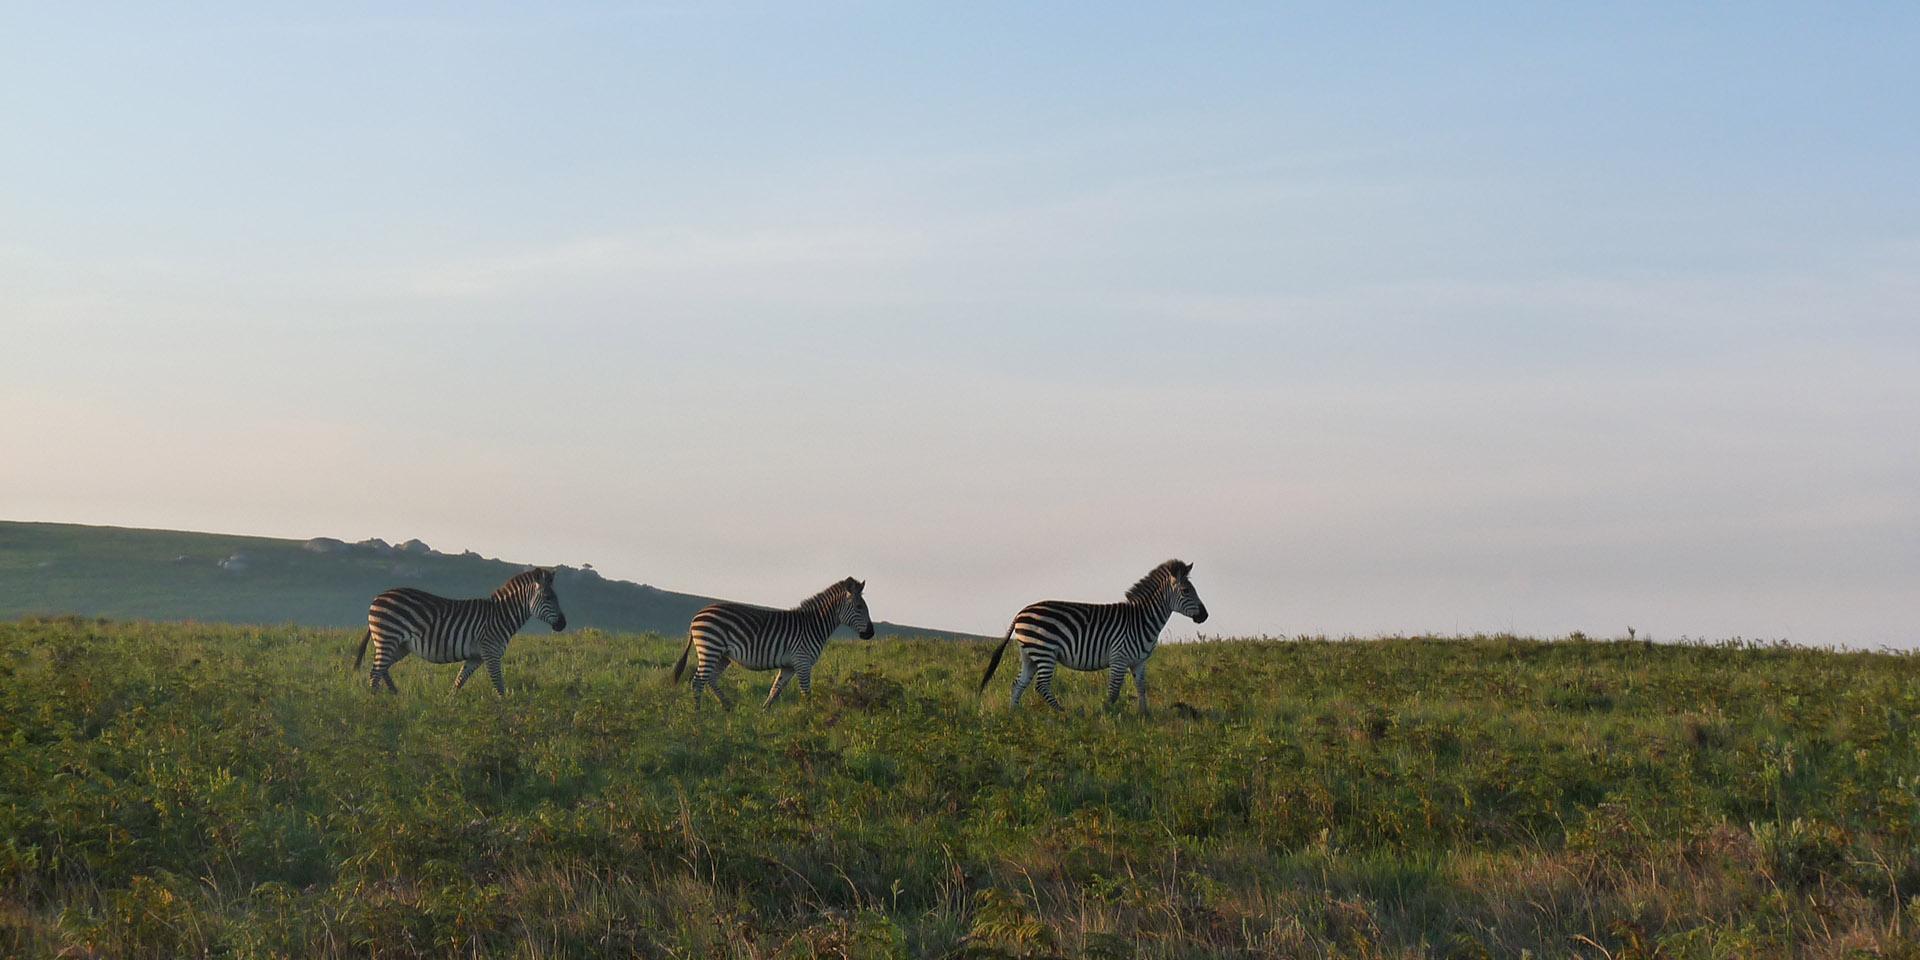 nyika national park malawian-style-malawi-adventures-experiences-holidays-specialist-tour-operator-malawi-national-parks-reserves-zebra